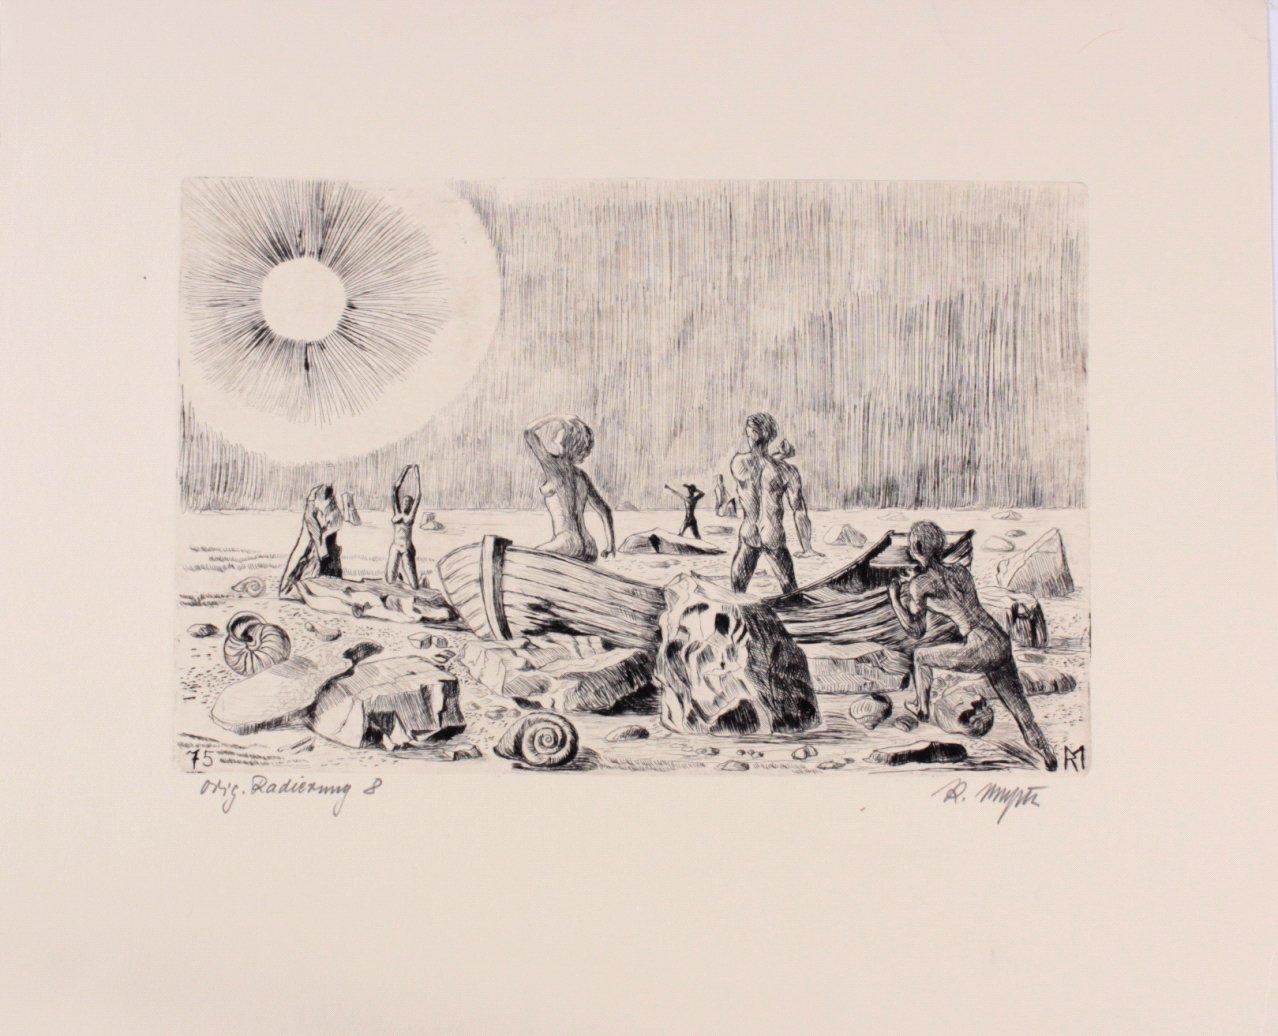 Kaltnadelradierung mit Plattenton, 20. Jh.